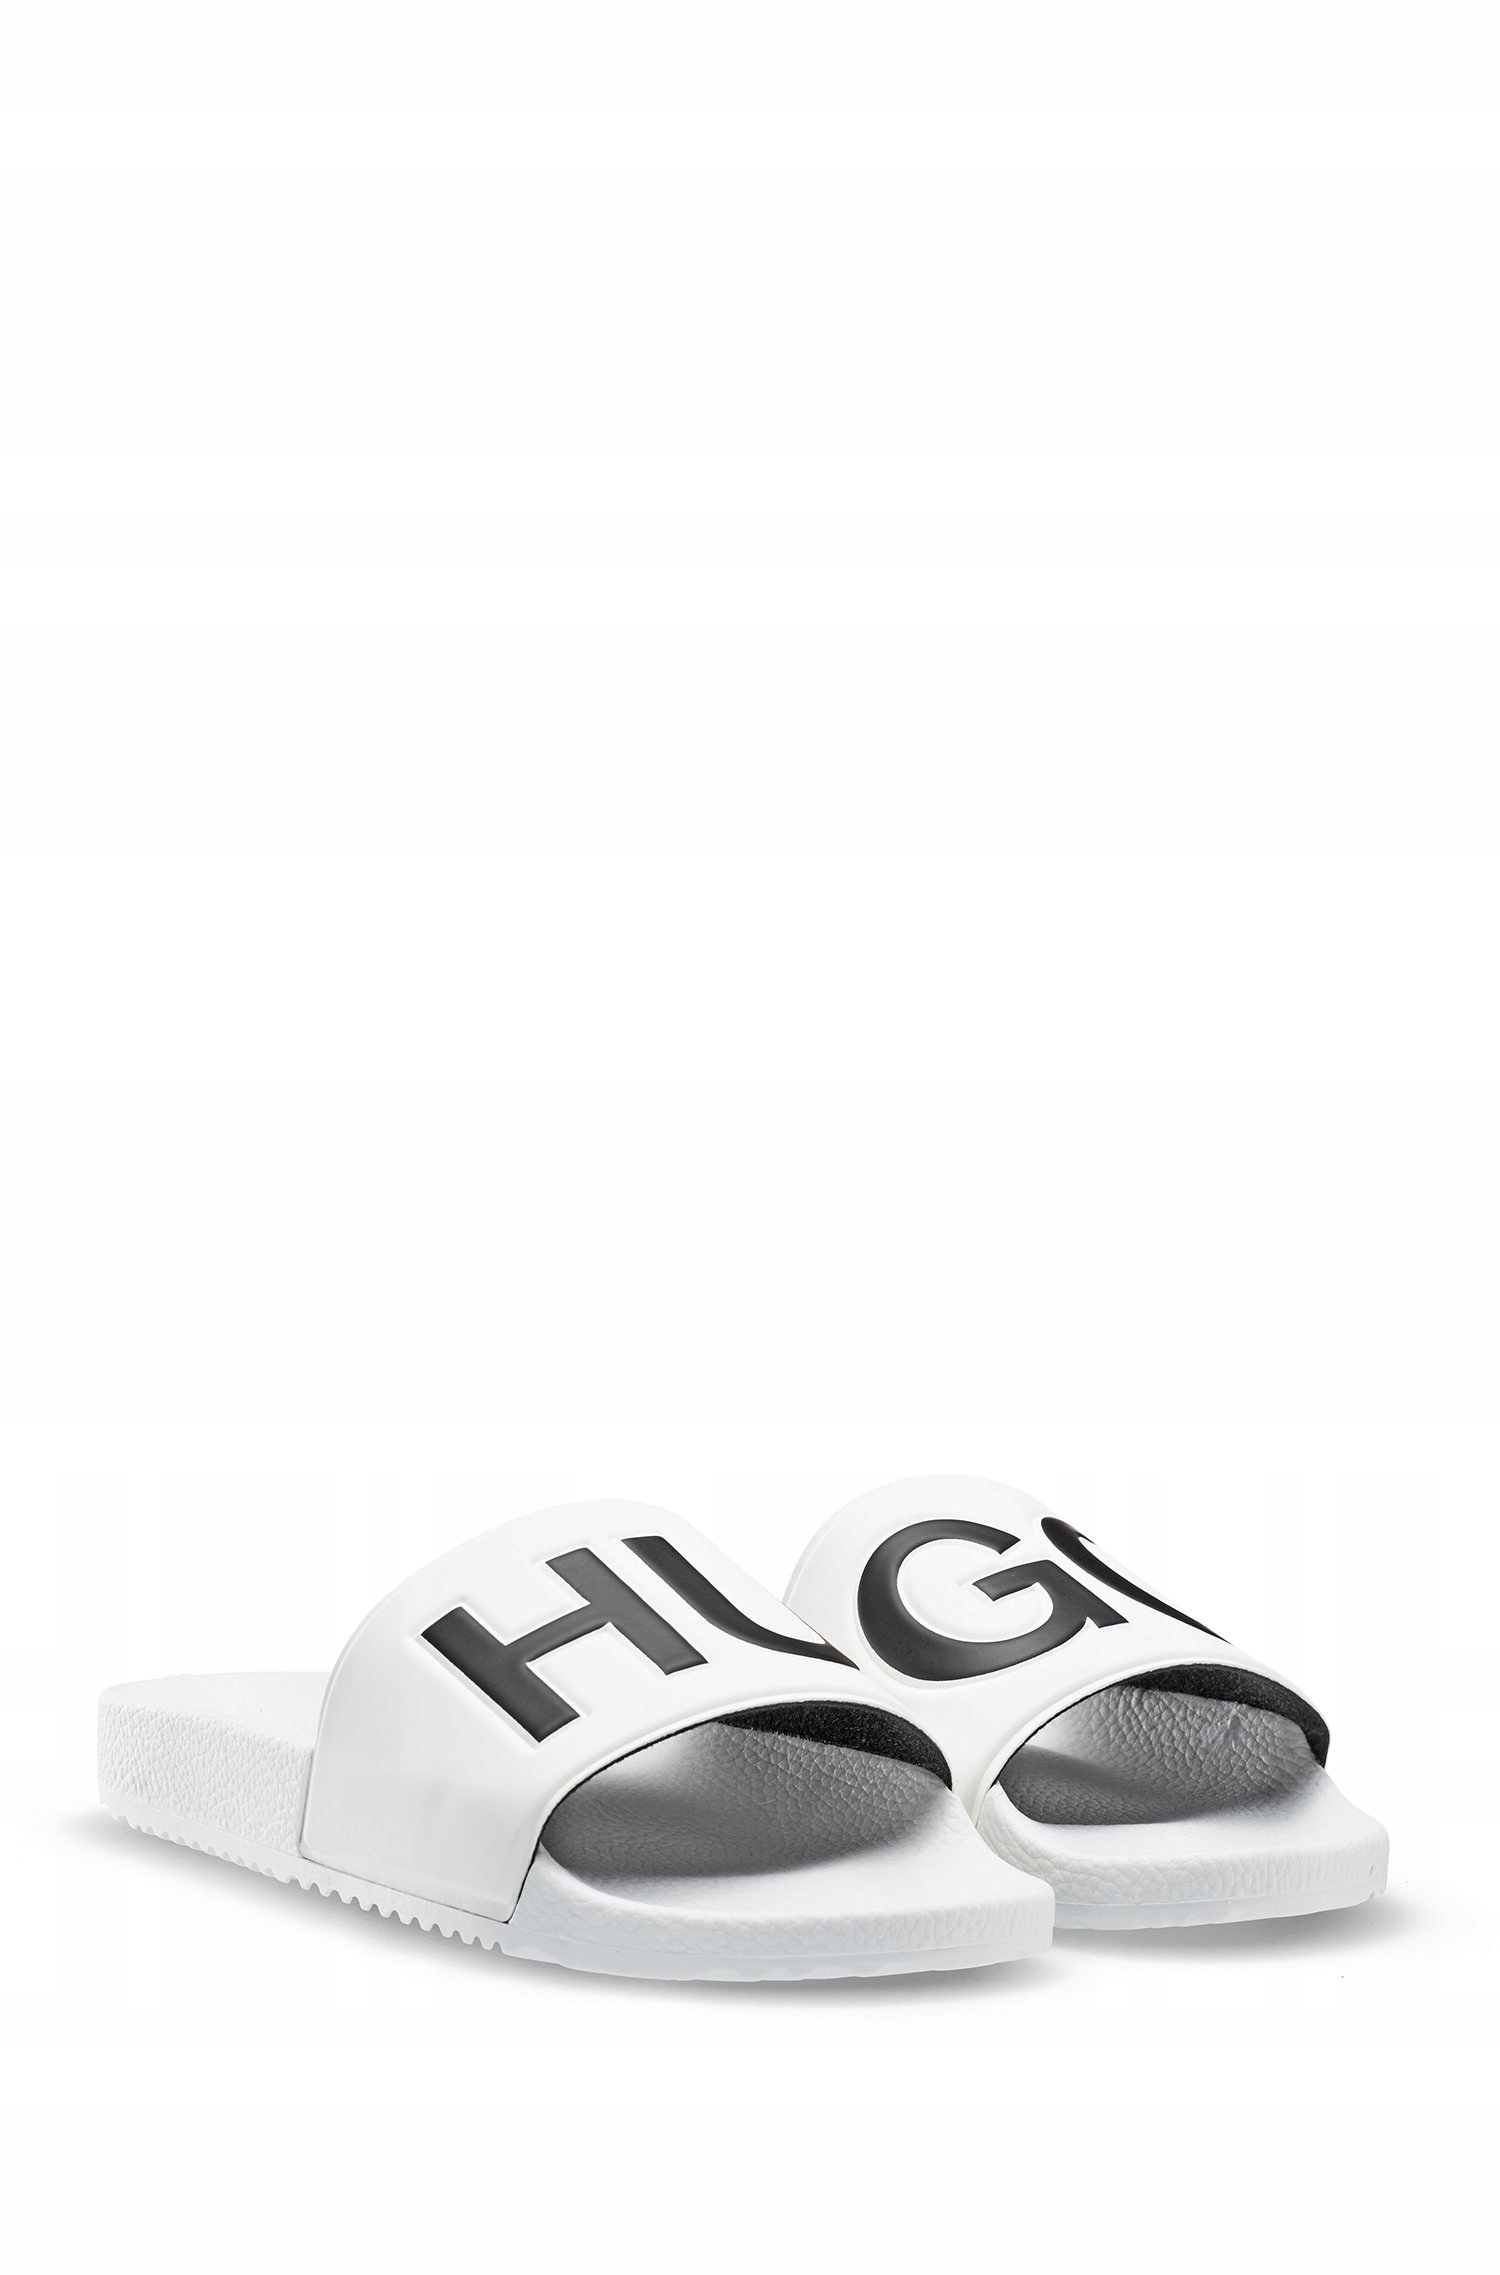 HUGO BOSS STYLOWE SUPER KLAPKI MĘSKIE R.46 WHB753